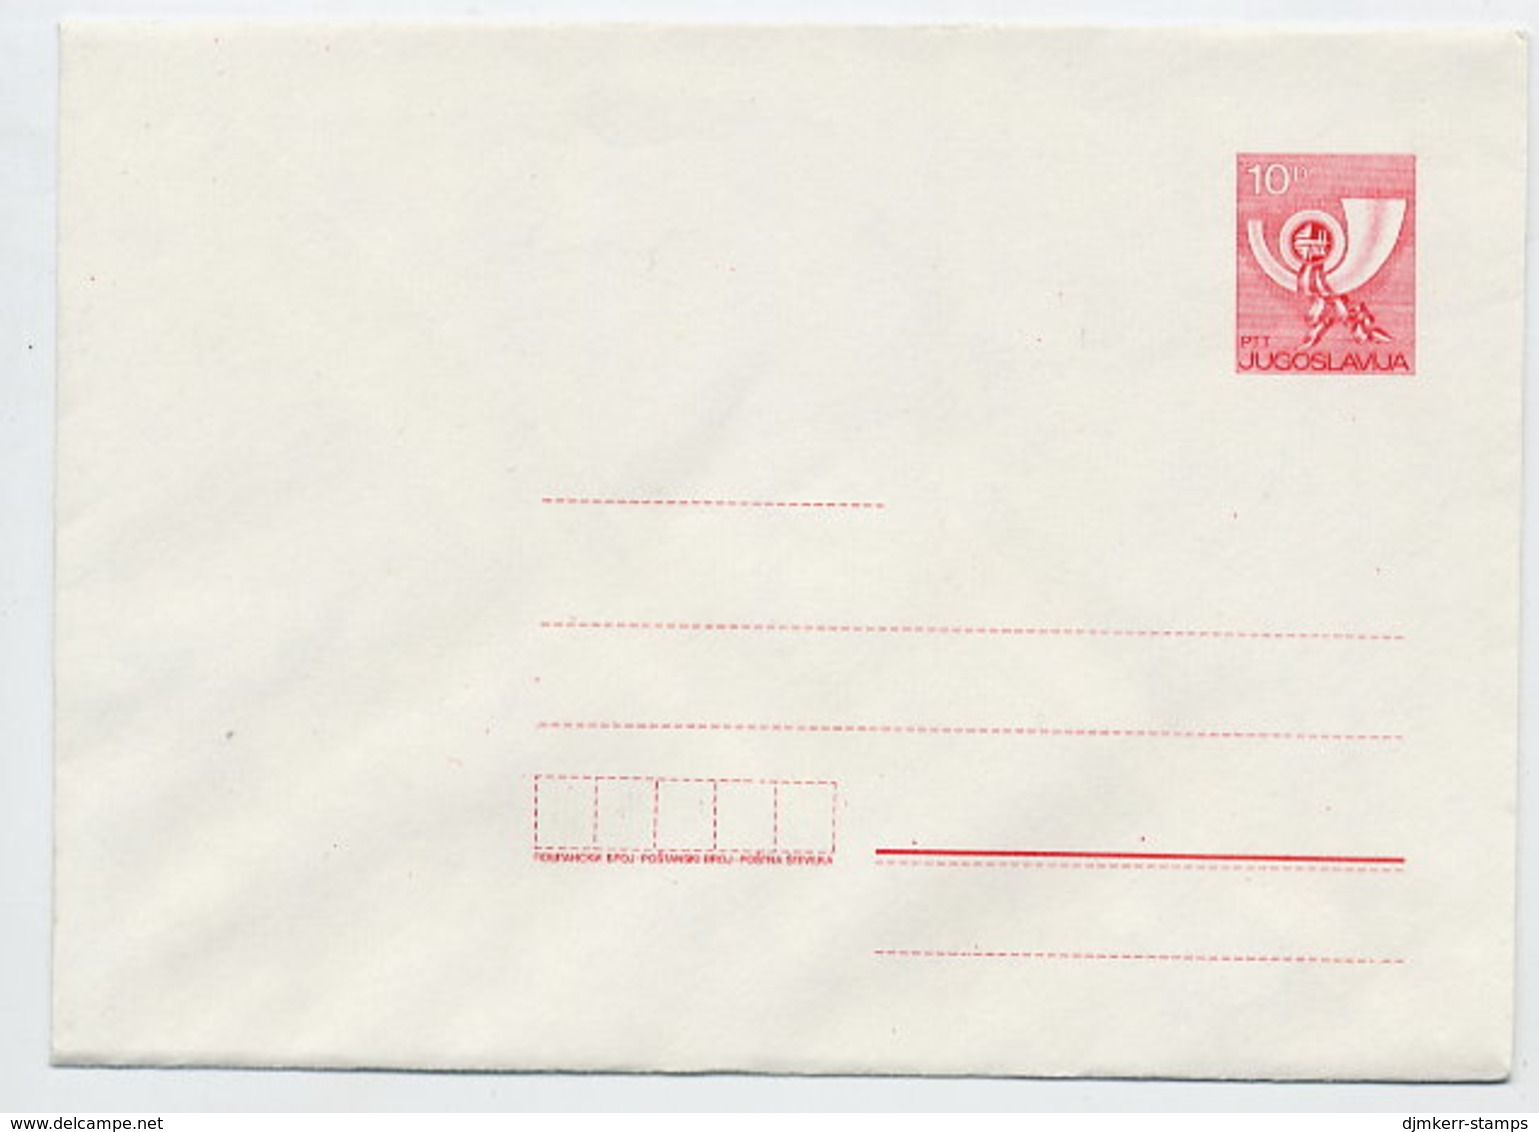 YUGOSLAVIA 1985 Posthorn 10 D. Envelope Format A, Unused. Michel U74A - Ganzsachen